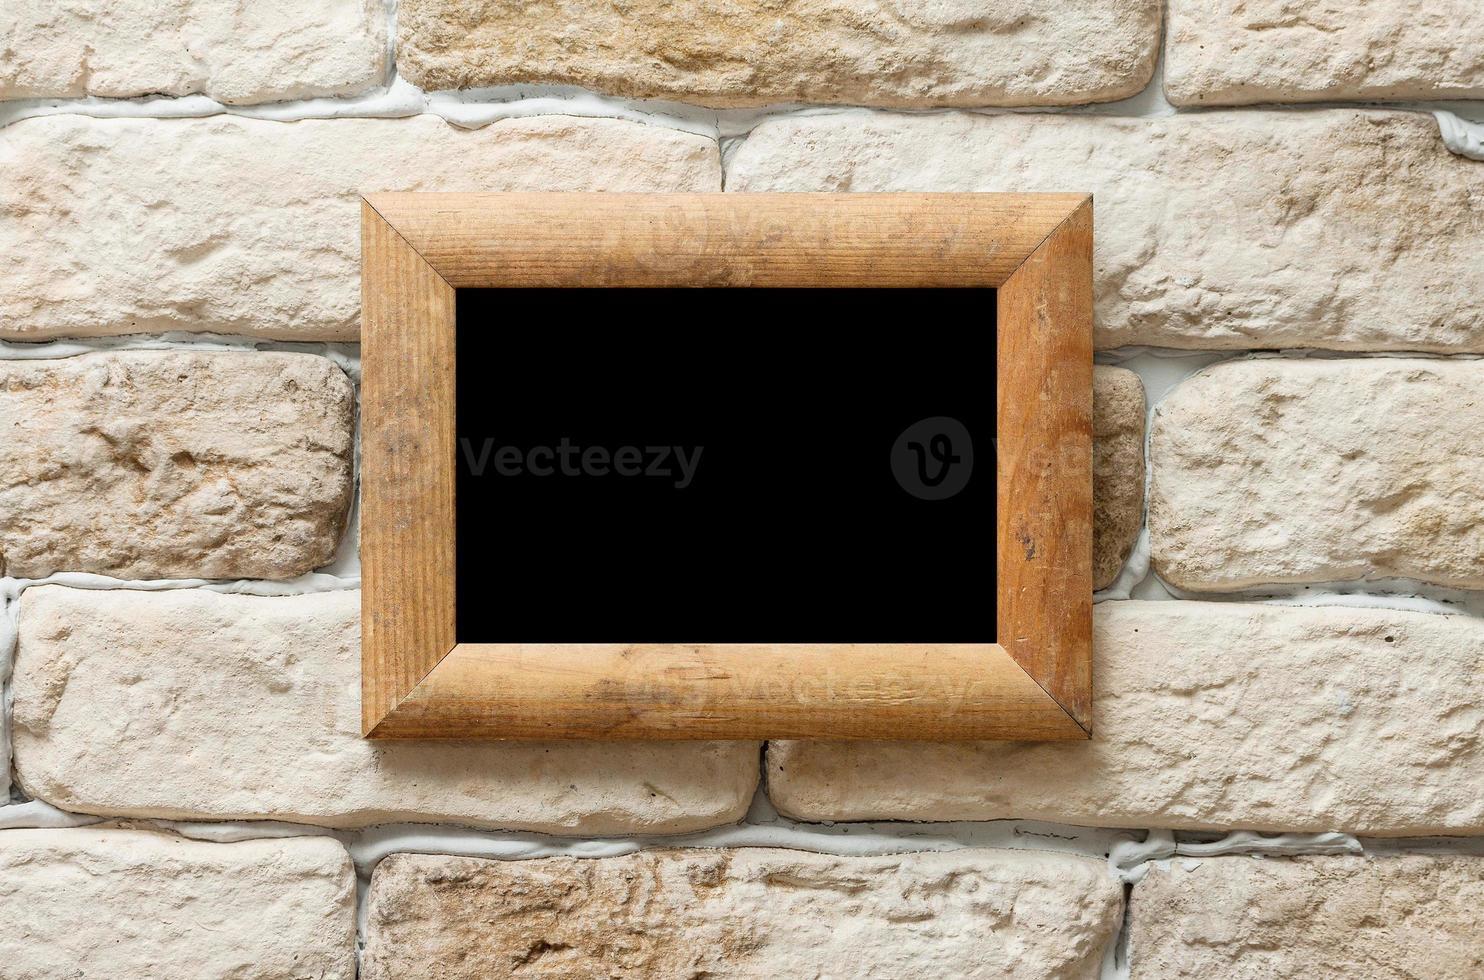 moldura na parede de tijolos foto